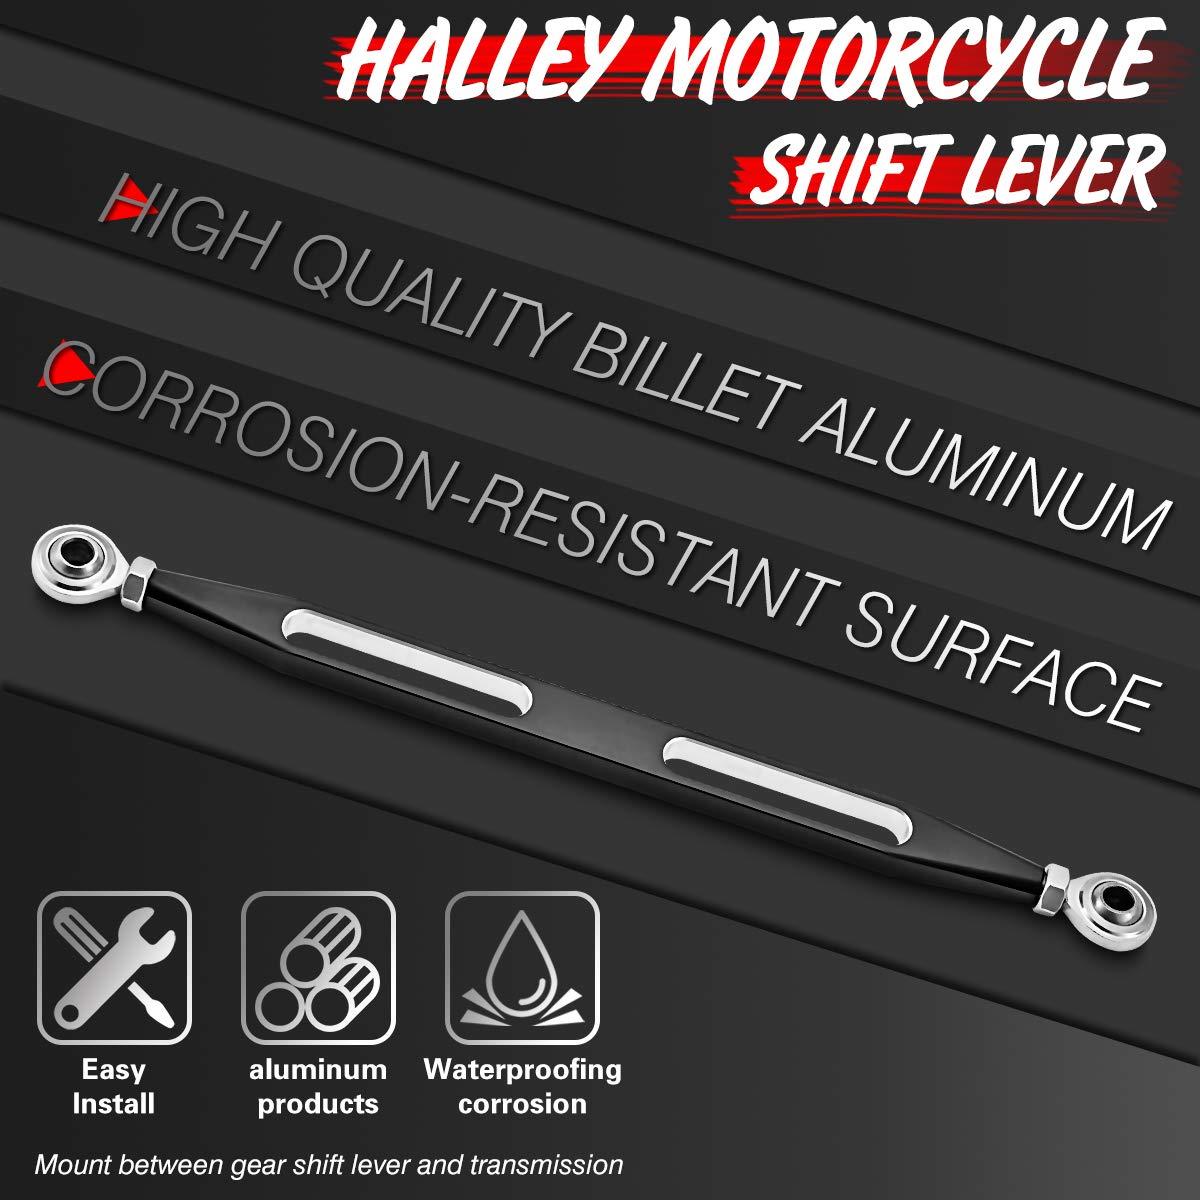 Vendaje de Cambio de Corte Profundo CNC para Harley Davidson Electra Street Tour Glides Trikes 1980-2017 Corte Profundo, Negro KaTur